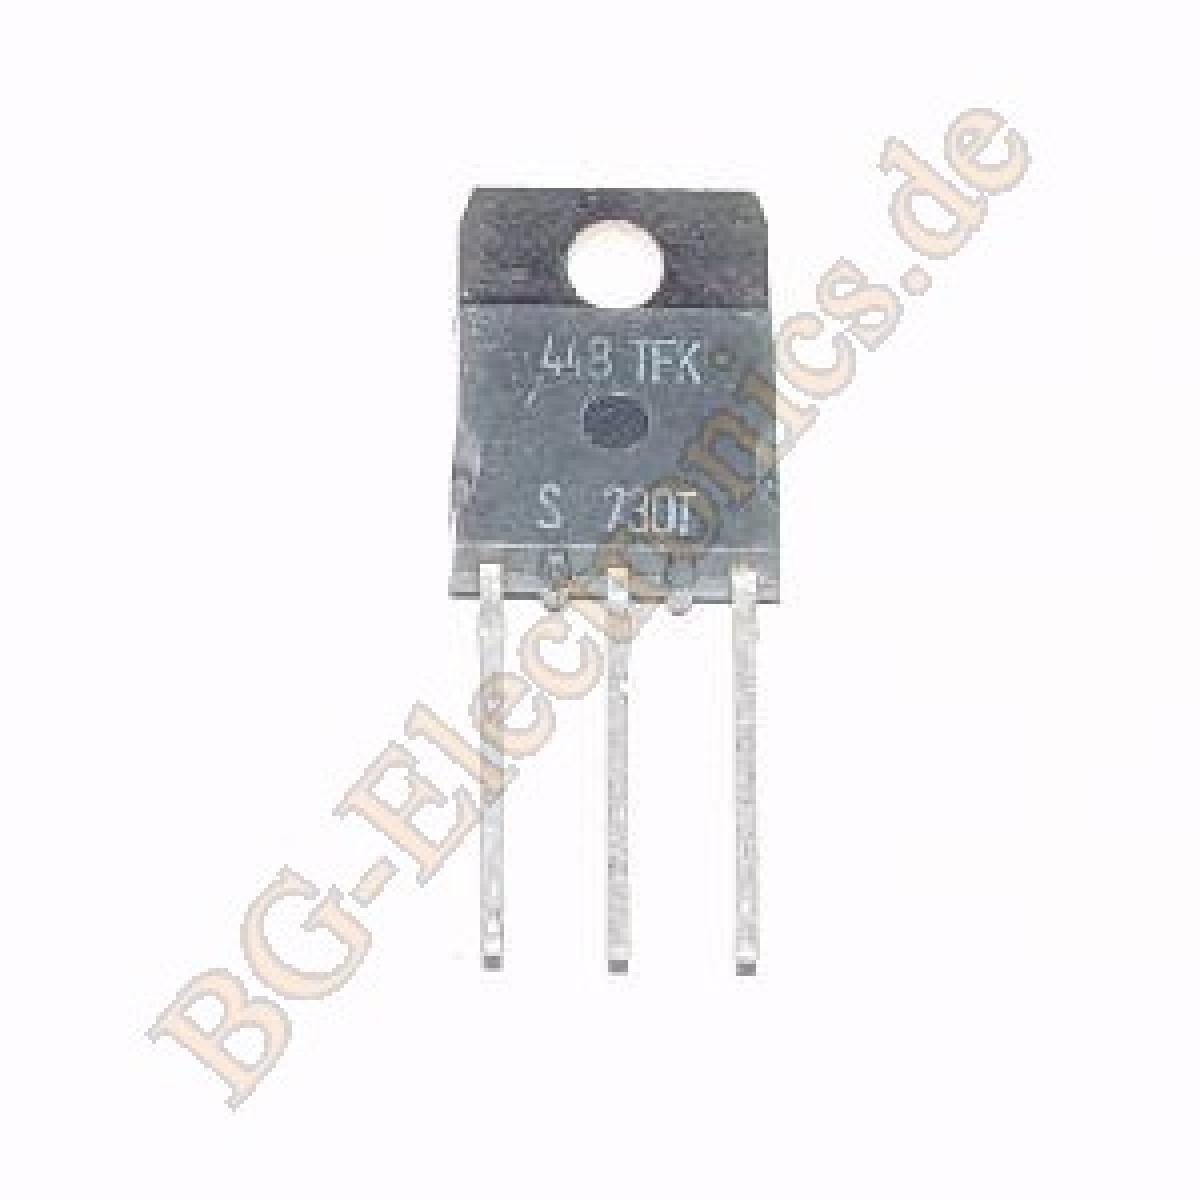 1 x buv30 NPN Darlington Transistor 80w 400v 7a TFK to-220 1pcs